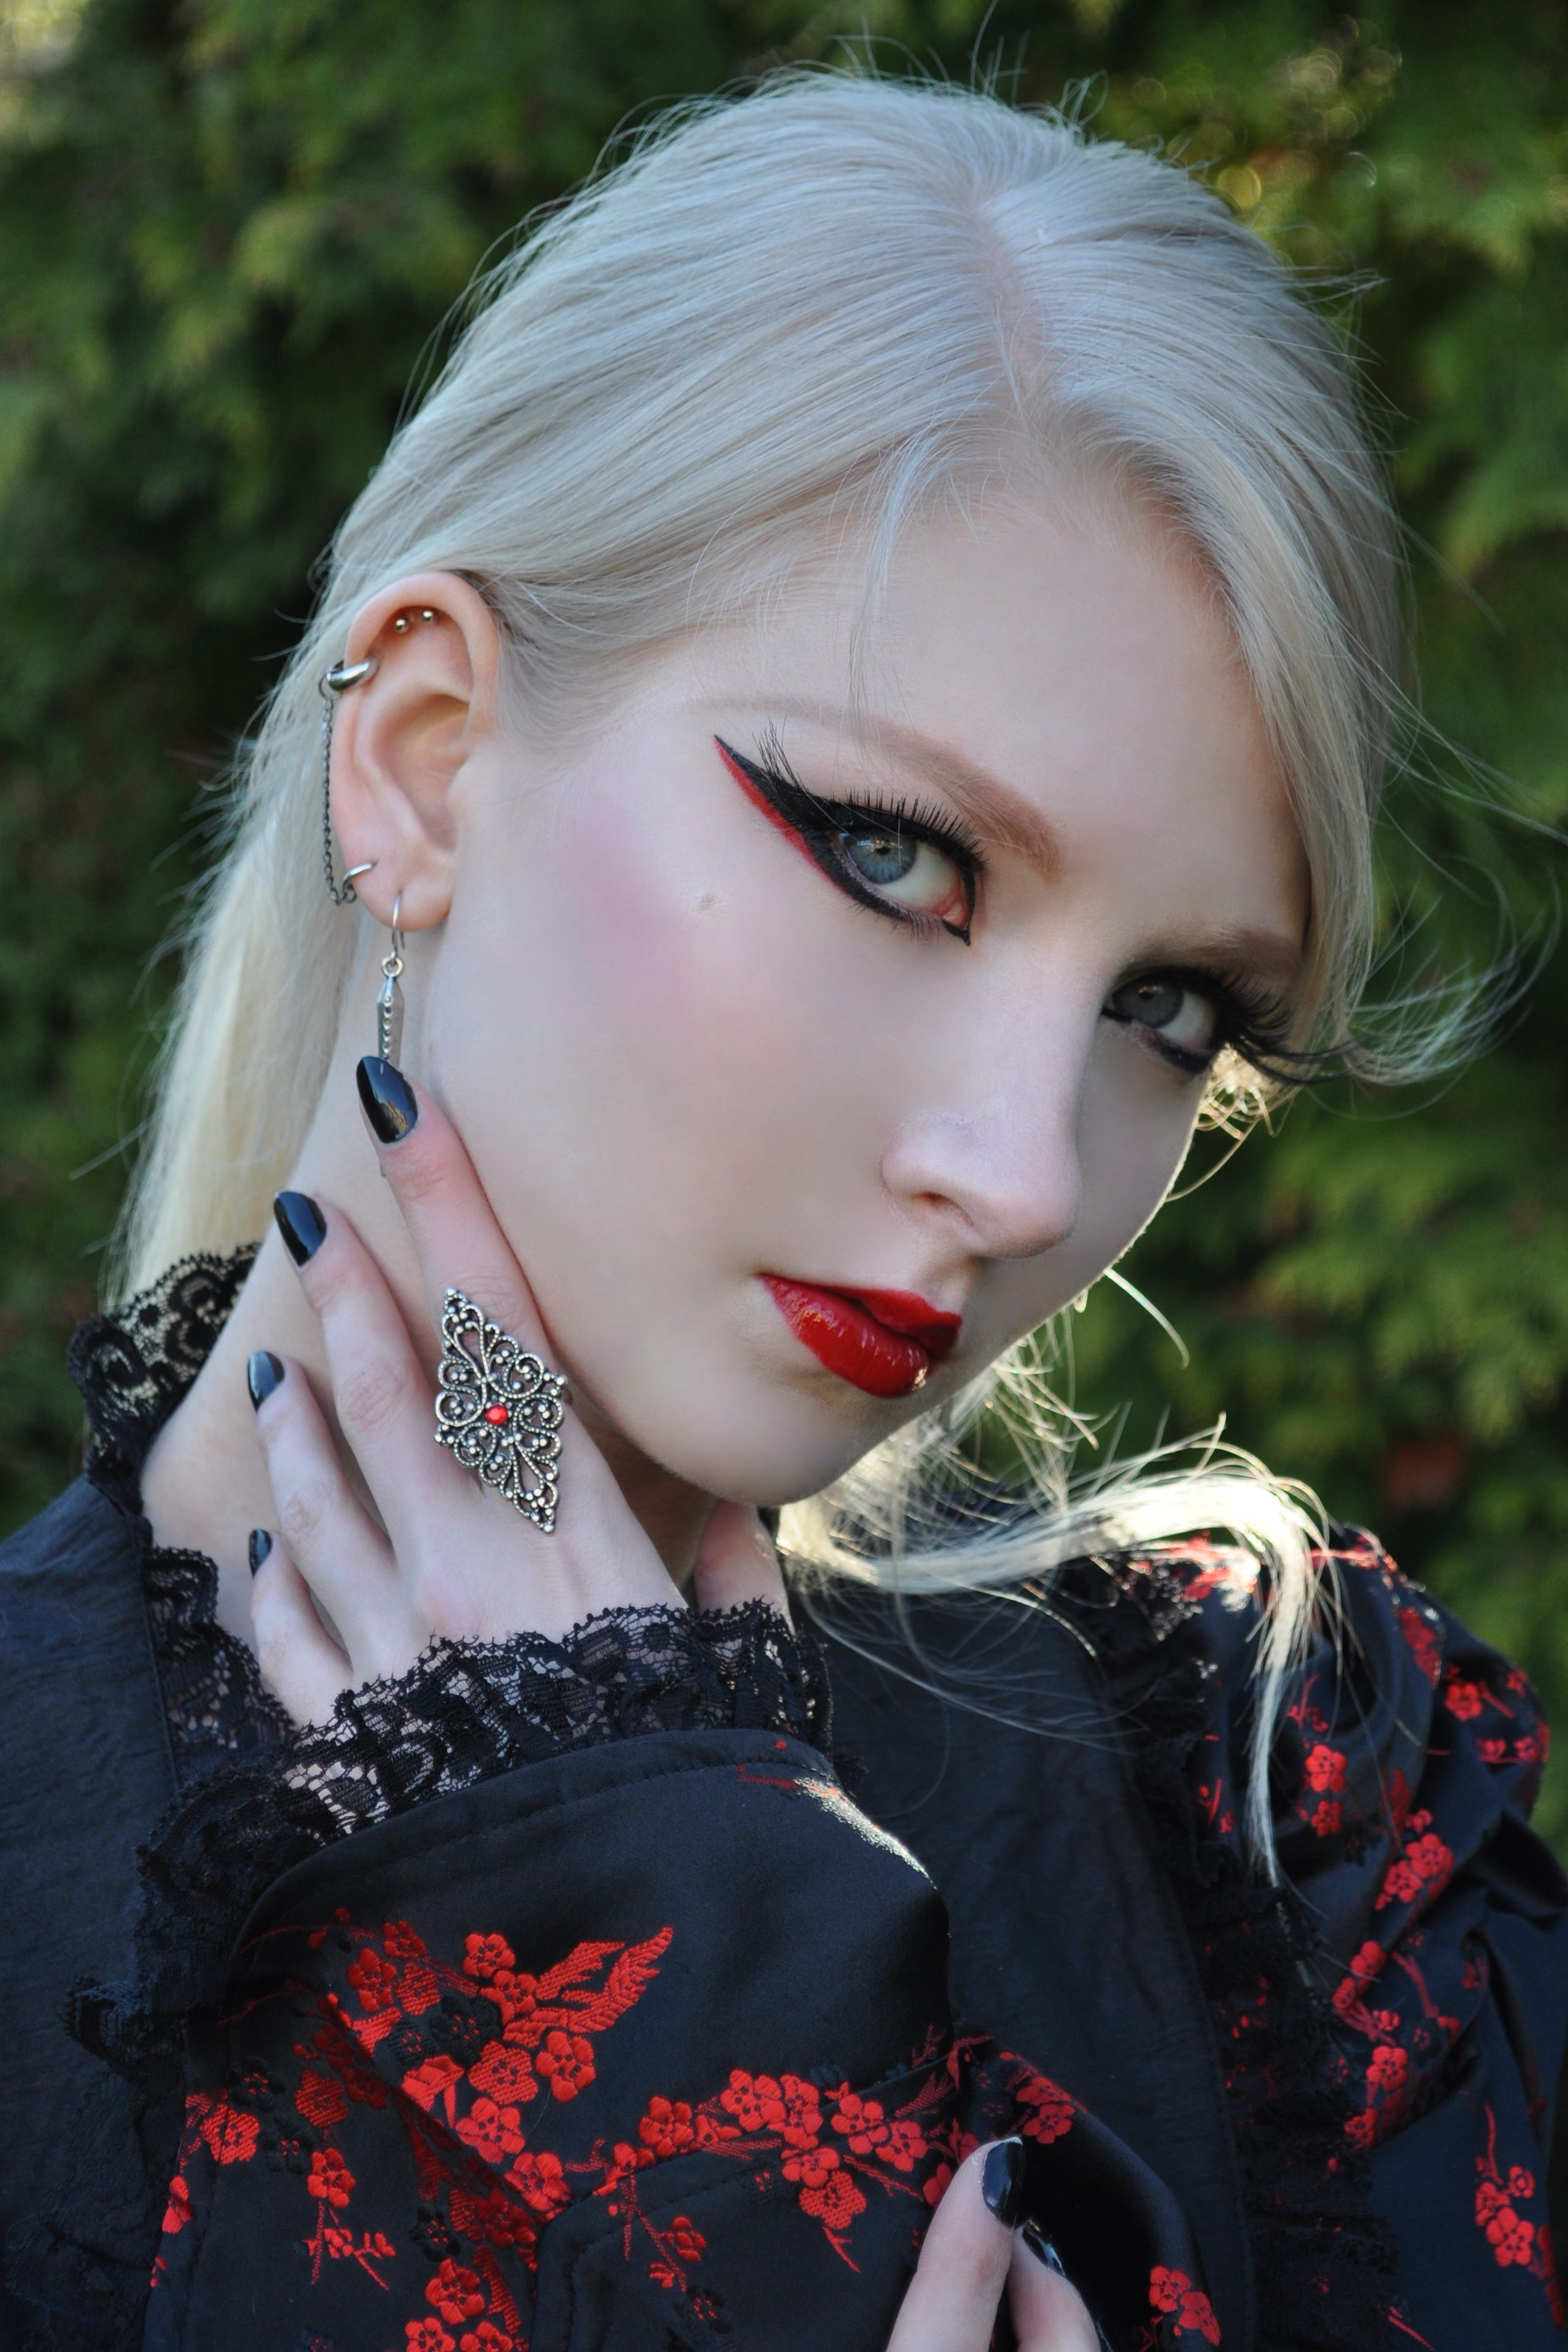 MariaAmanda altmodel japan makeup clothes piercings hair